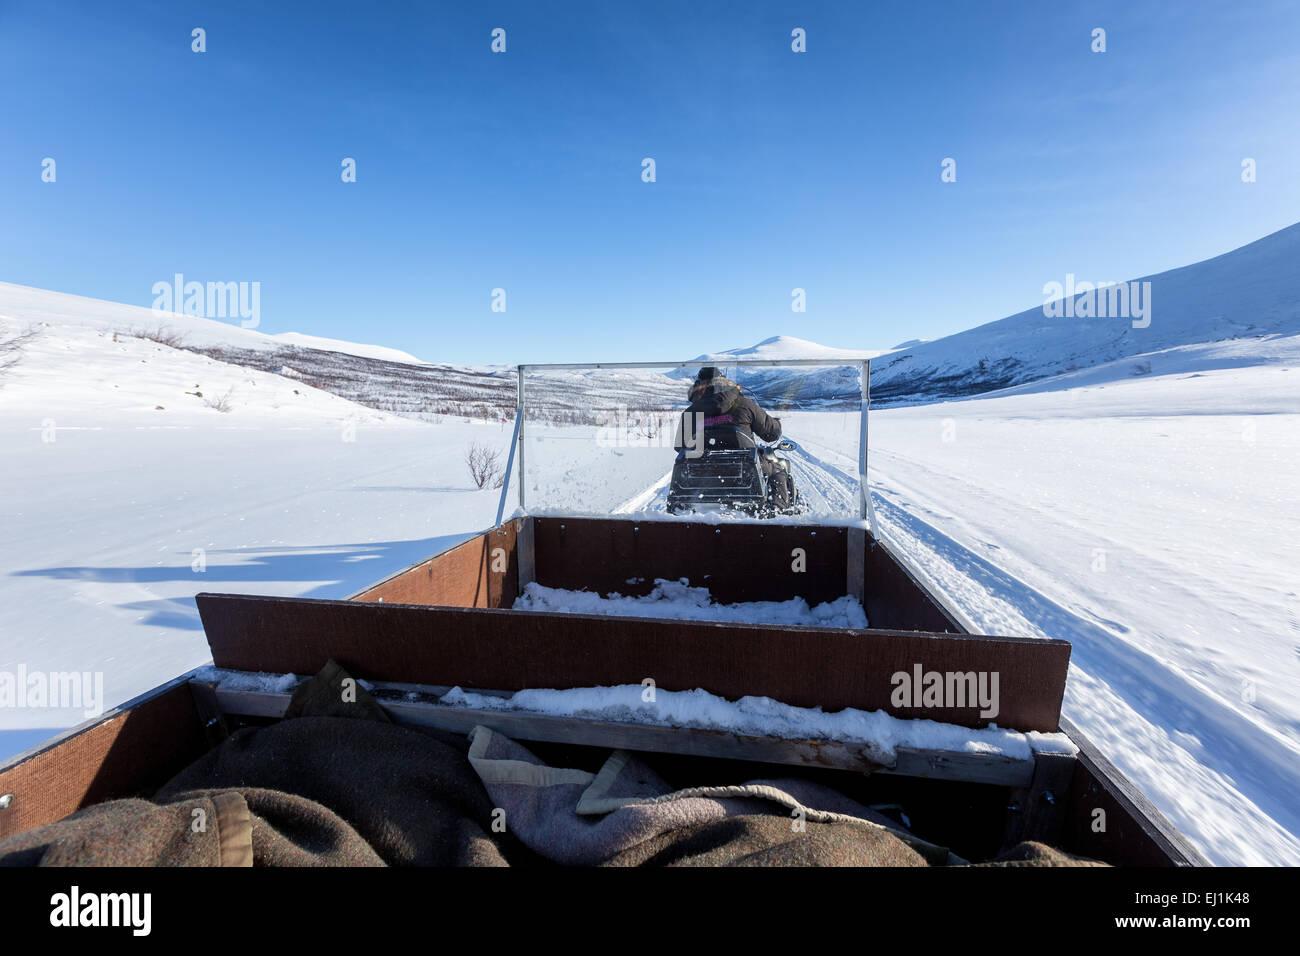 Travelling in the sledge of a snowmobile at Kebnekaise mountain area, Nikkaluokta, Kiruna, Sweden, Europe, EU - Stock Image